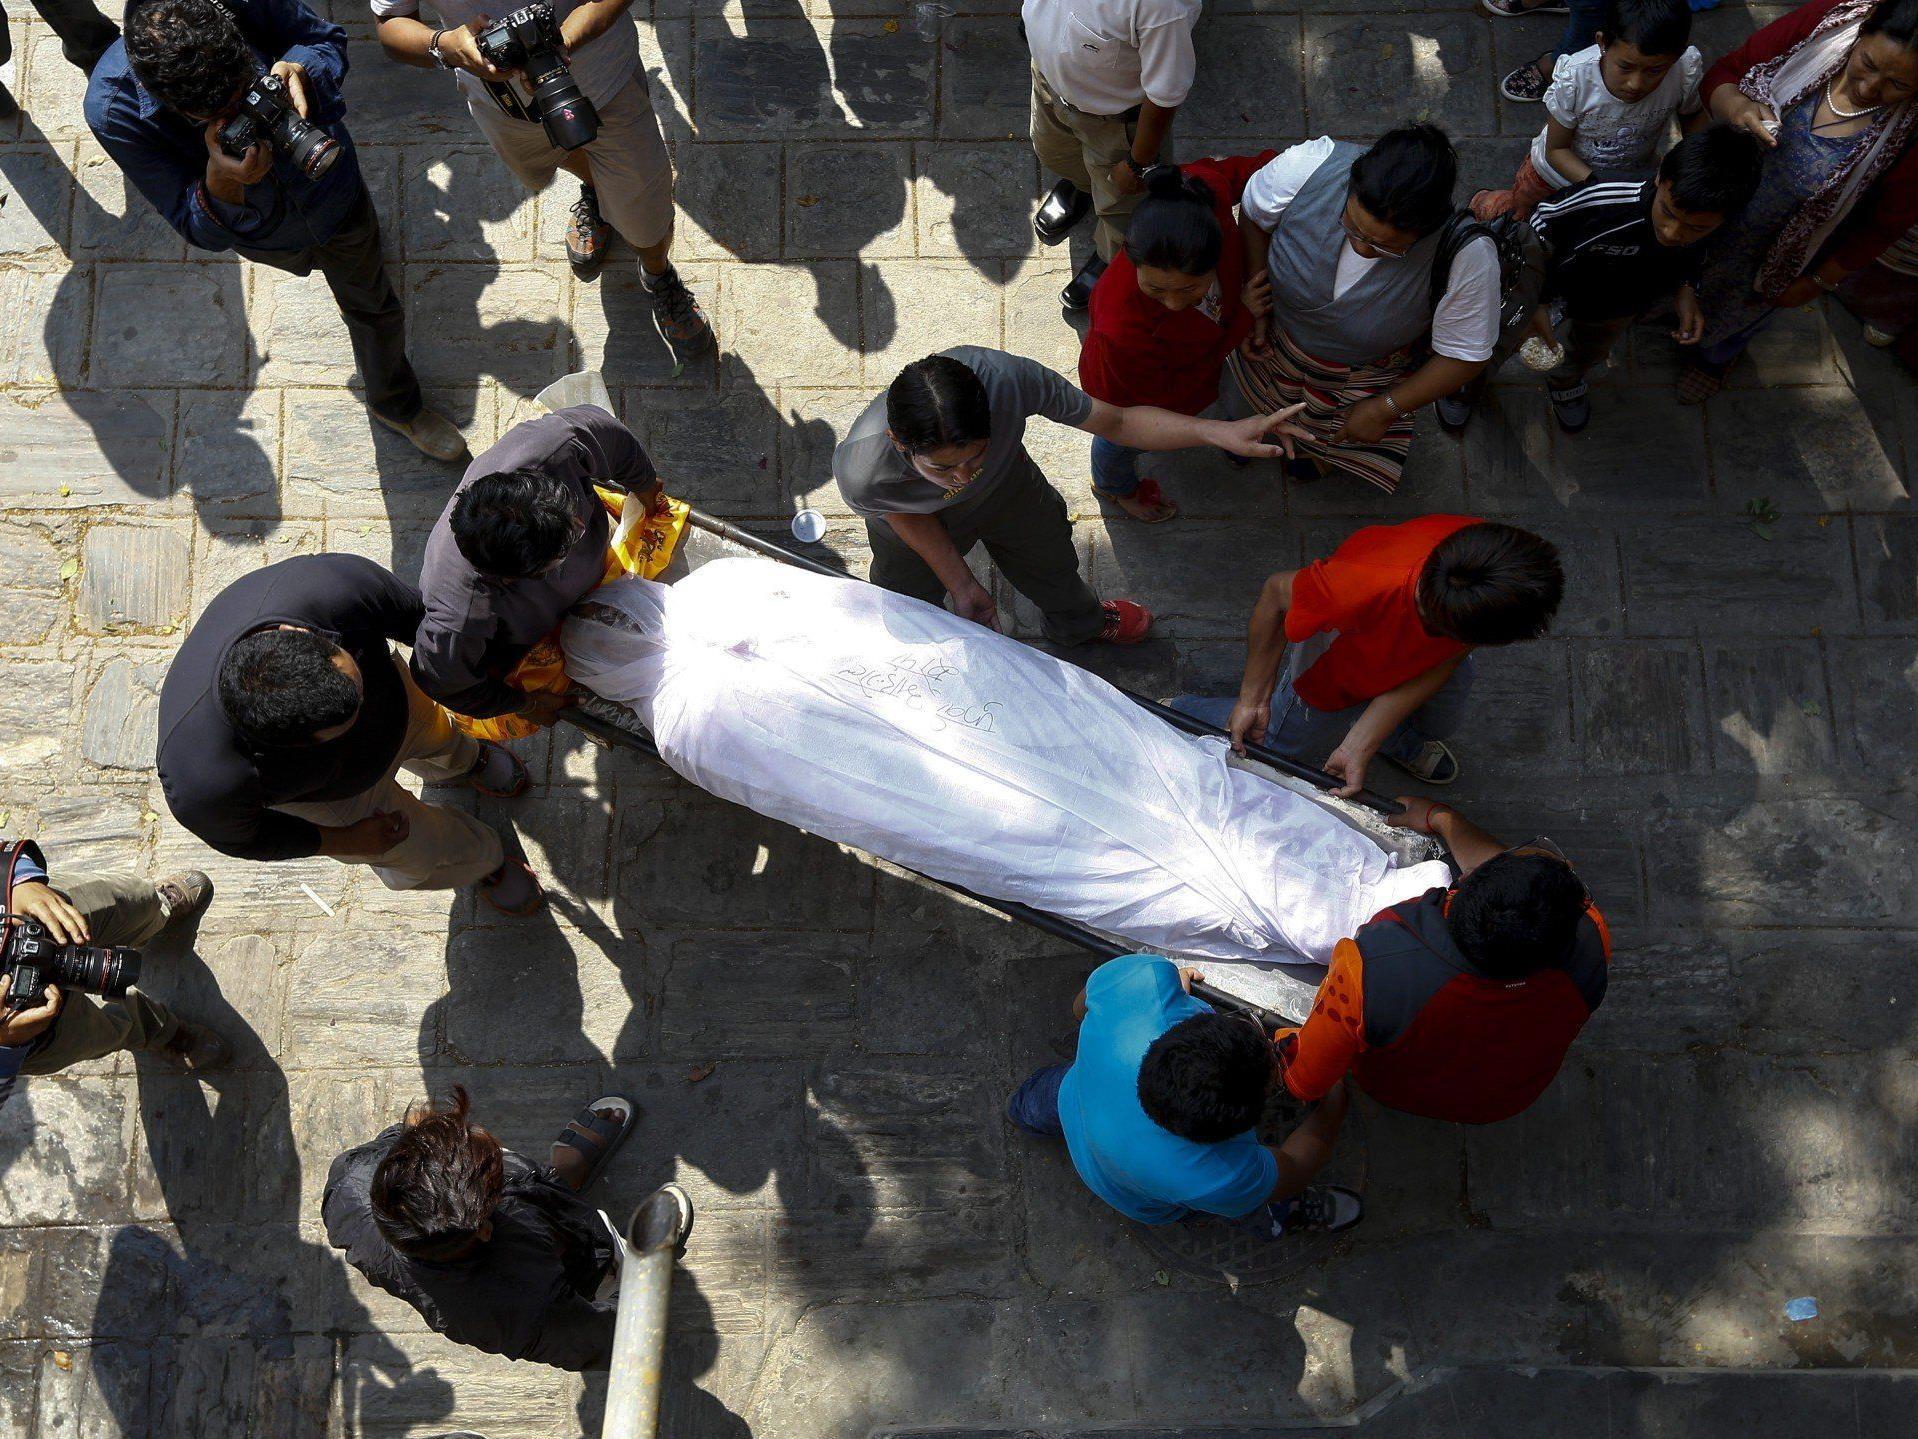 Lawinenunglück am Mount Everest fordert 16 Tote: Sherpas sagen alle Expeditionen ab.